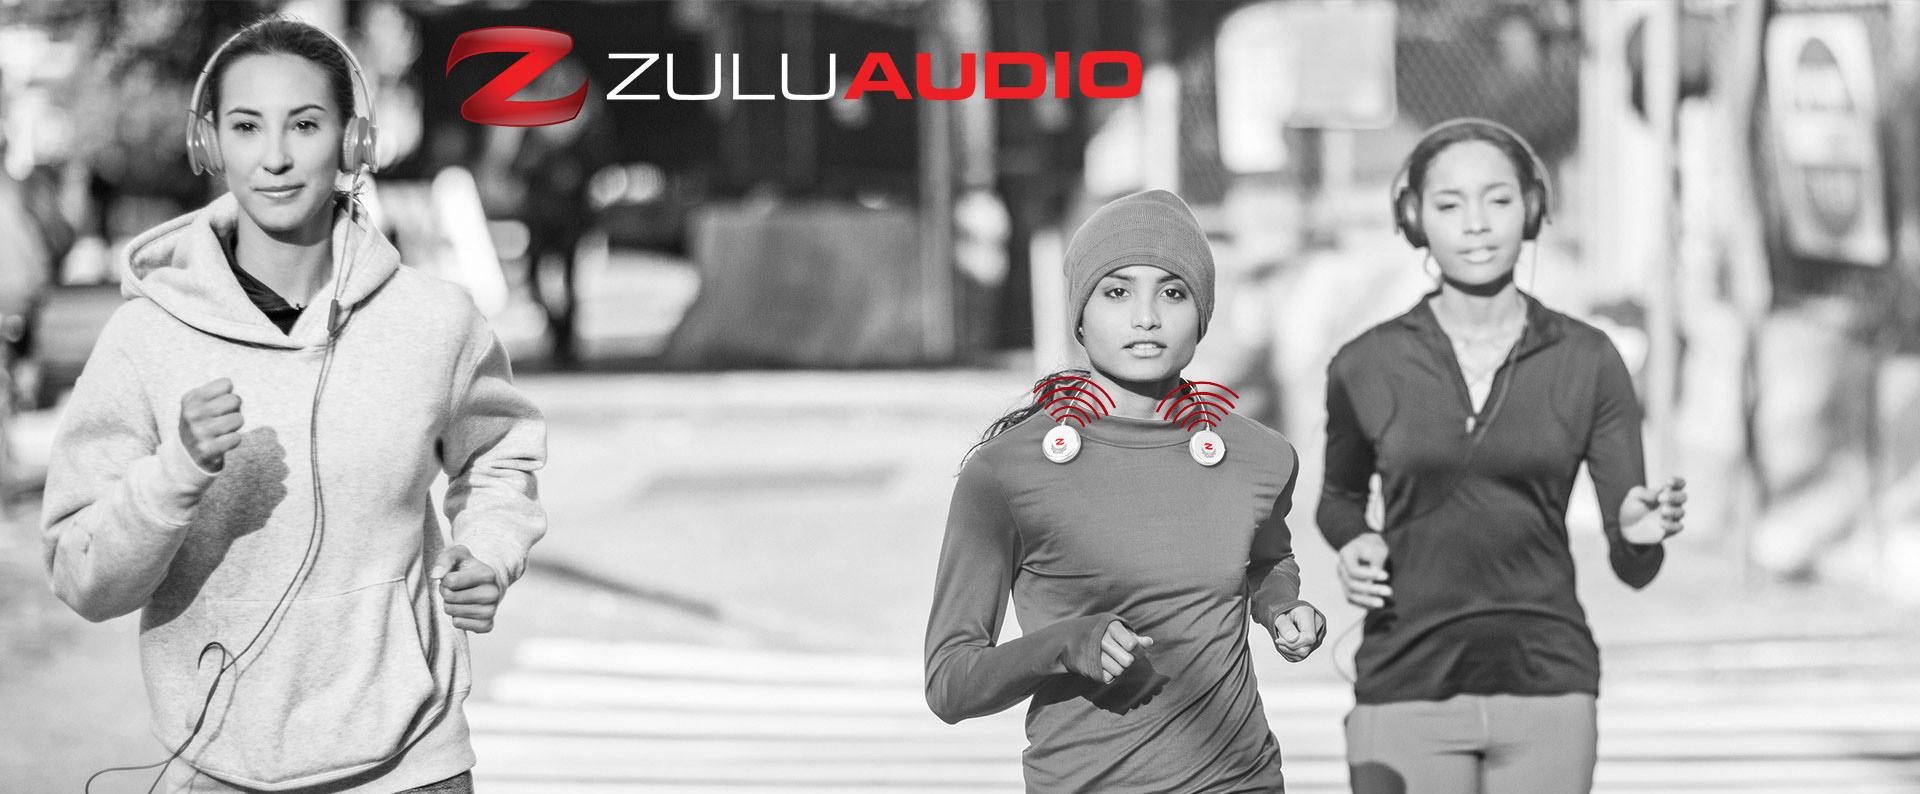 Zulu Audio Safe Magnetic Wearable Speakers